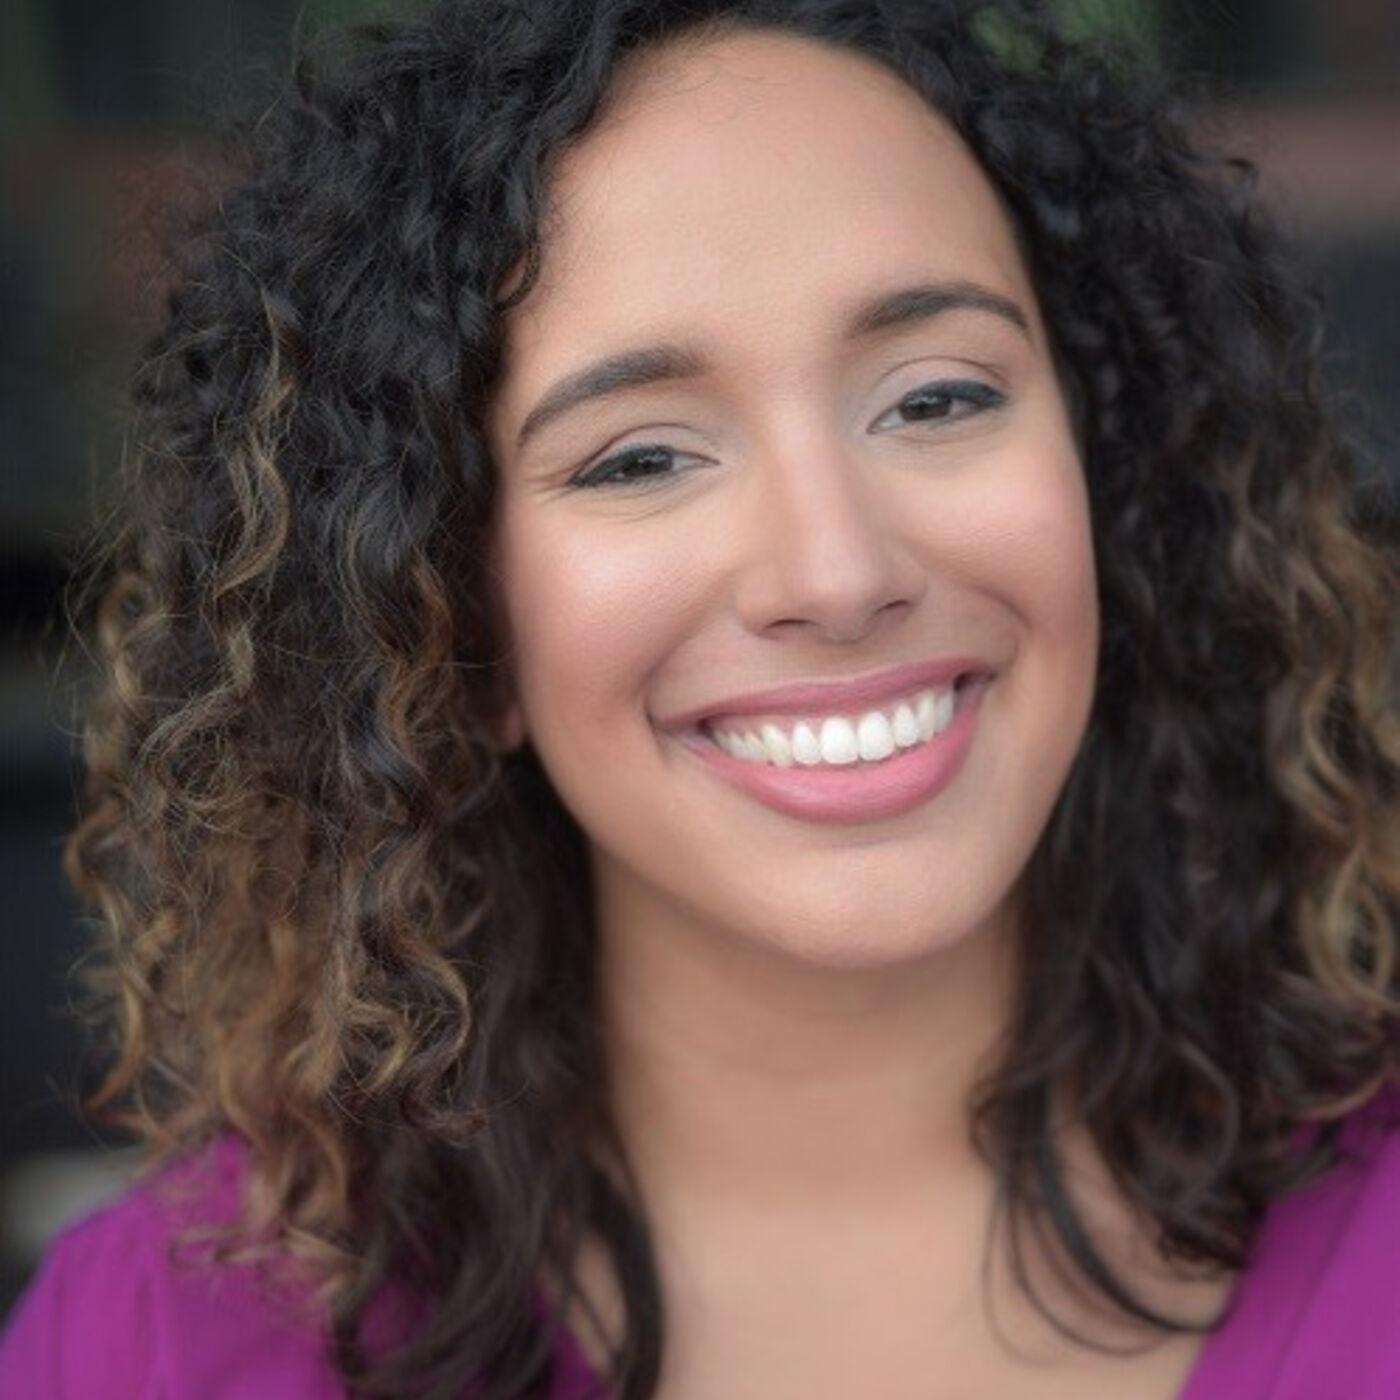 Carly Jones, Program Director at N.C. Arts Council; Performer